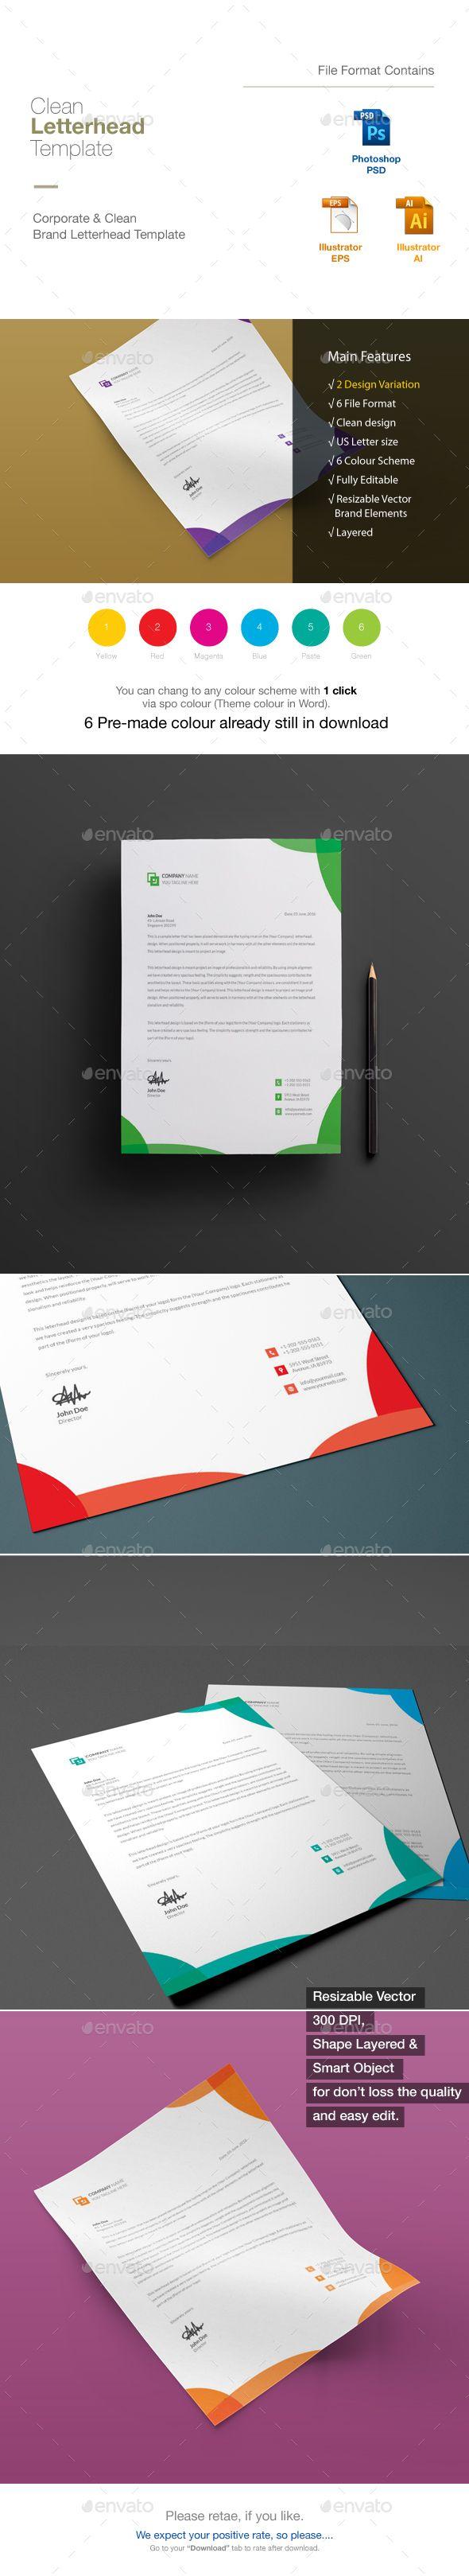 Letterhead Letterhead Stationery printing and